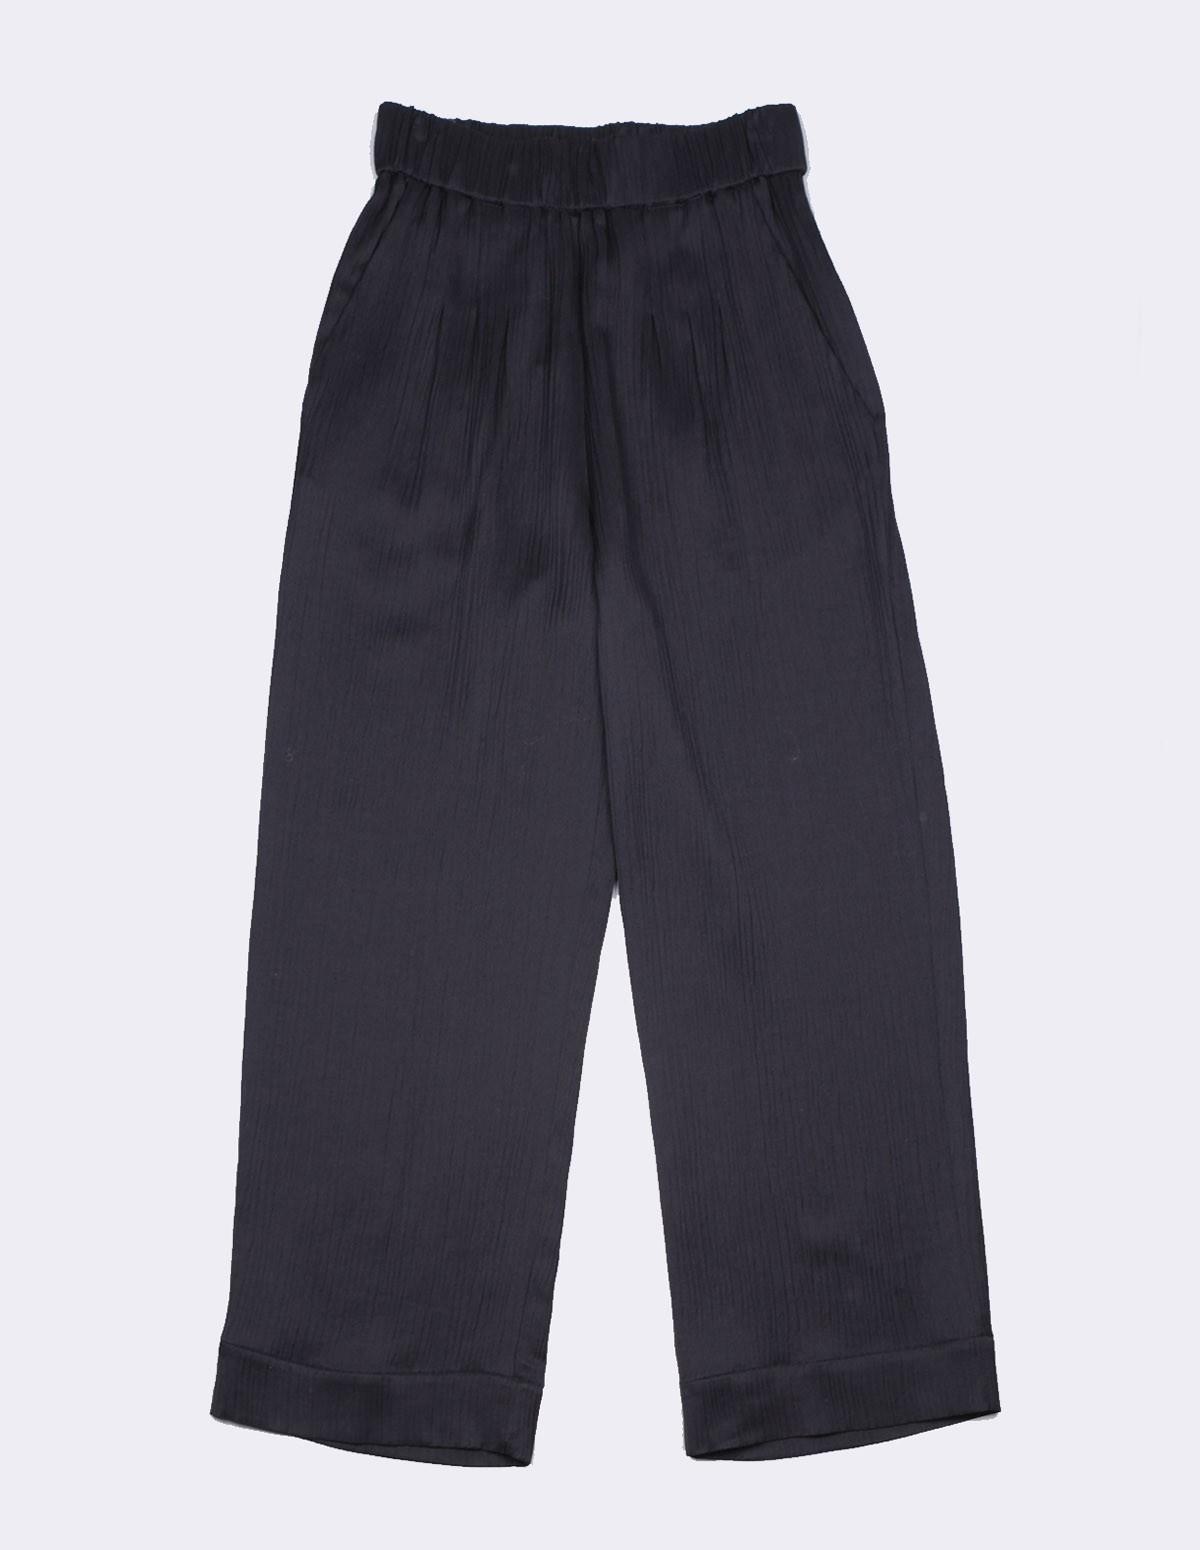 Pom 7142f/20668 Pants Exclu Ft - 99 NOIR